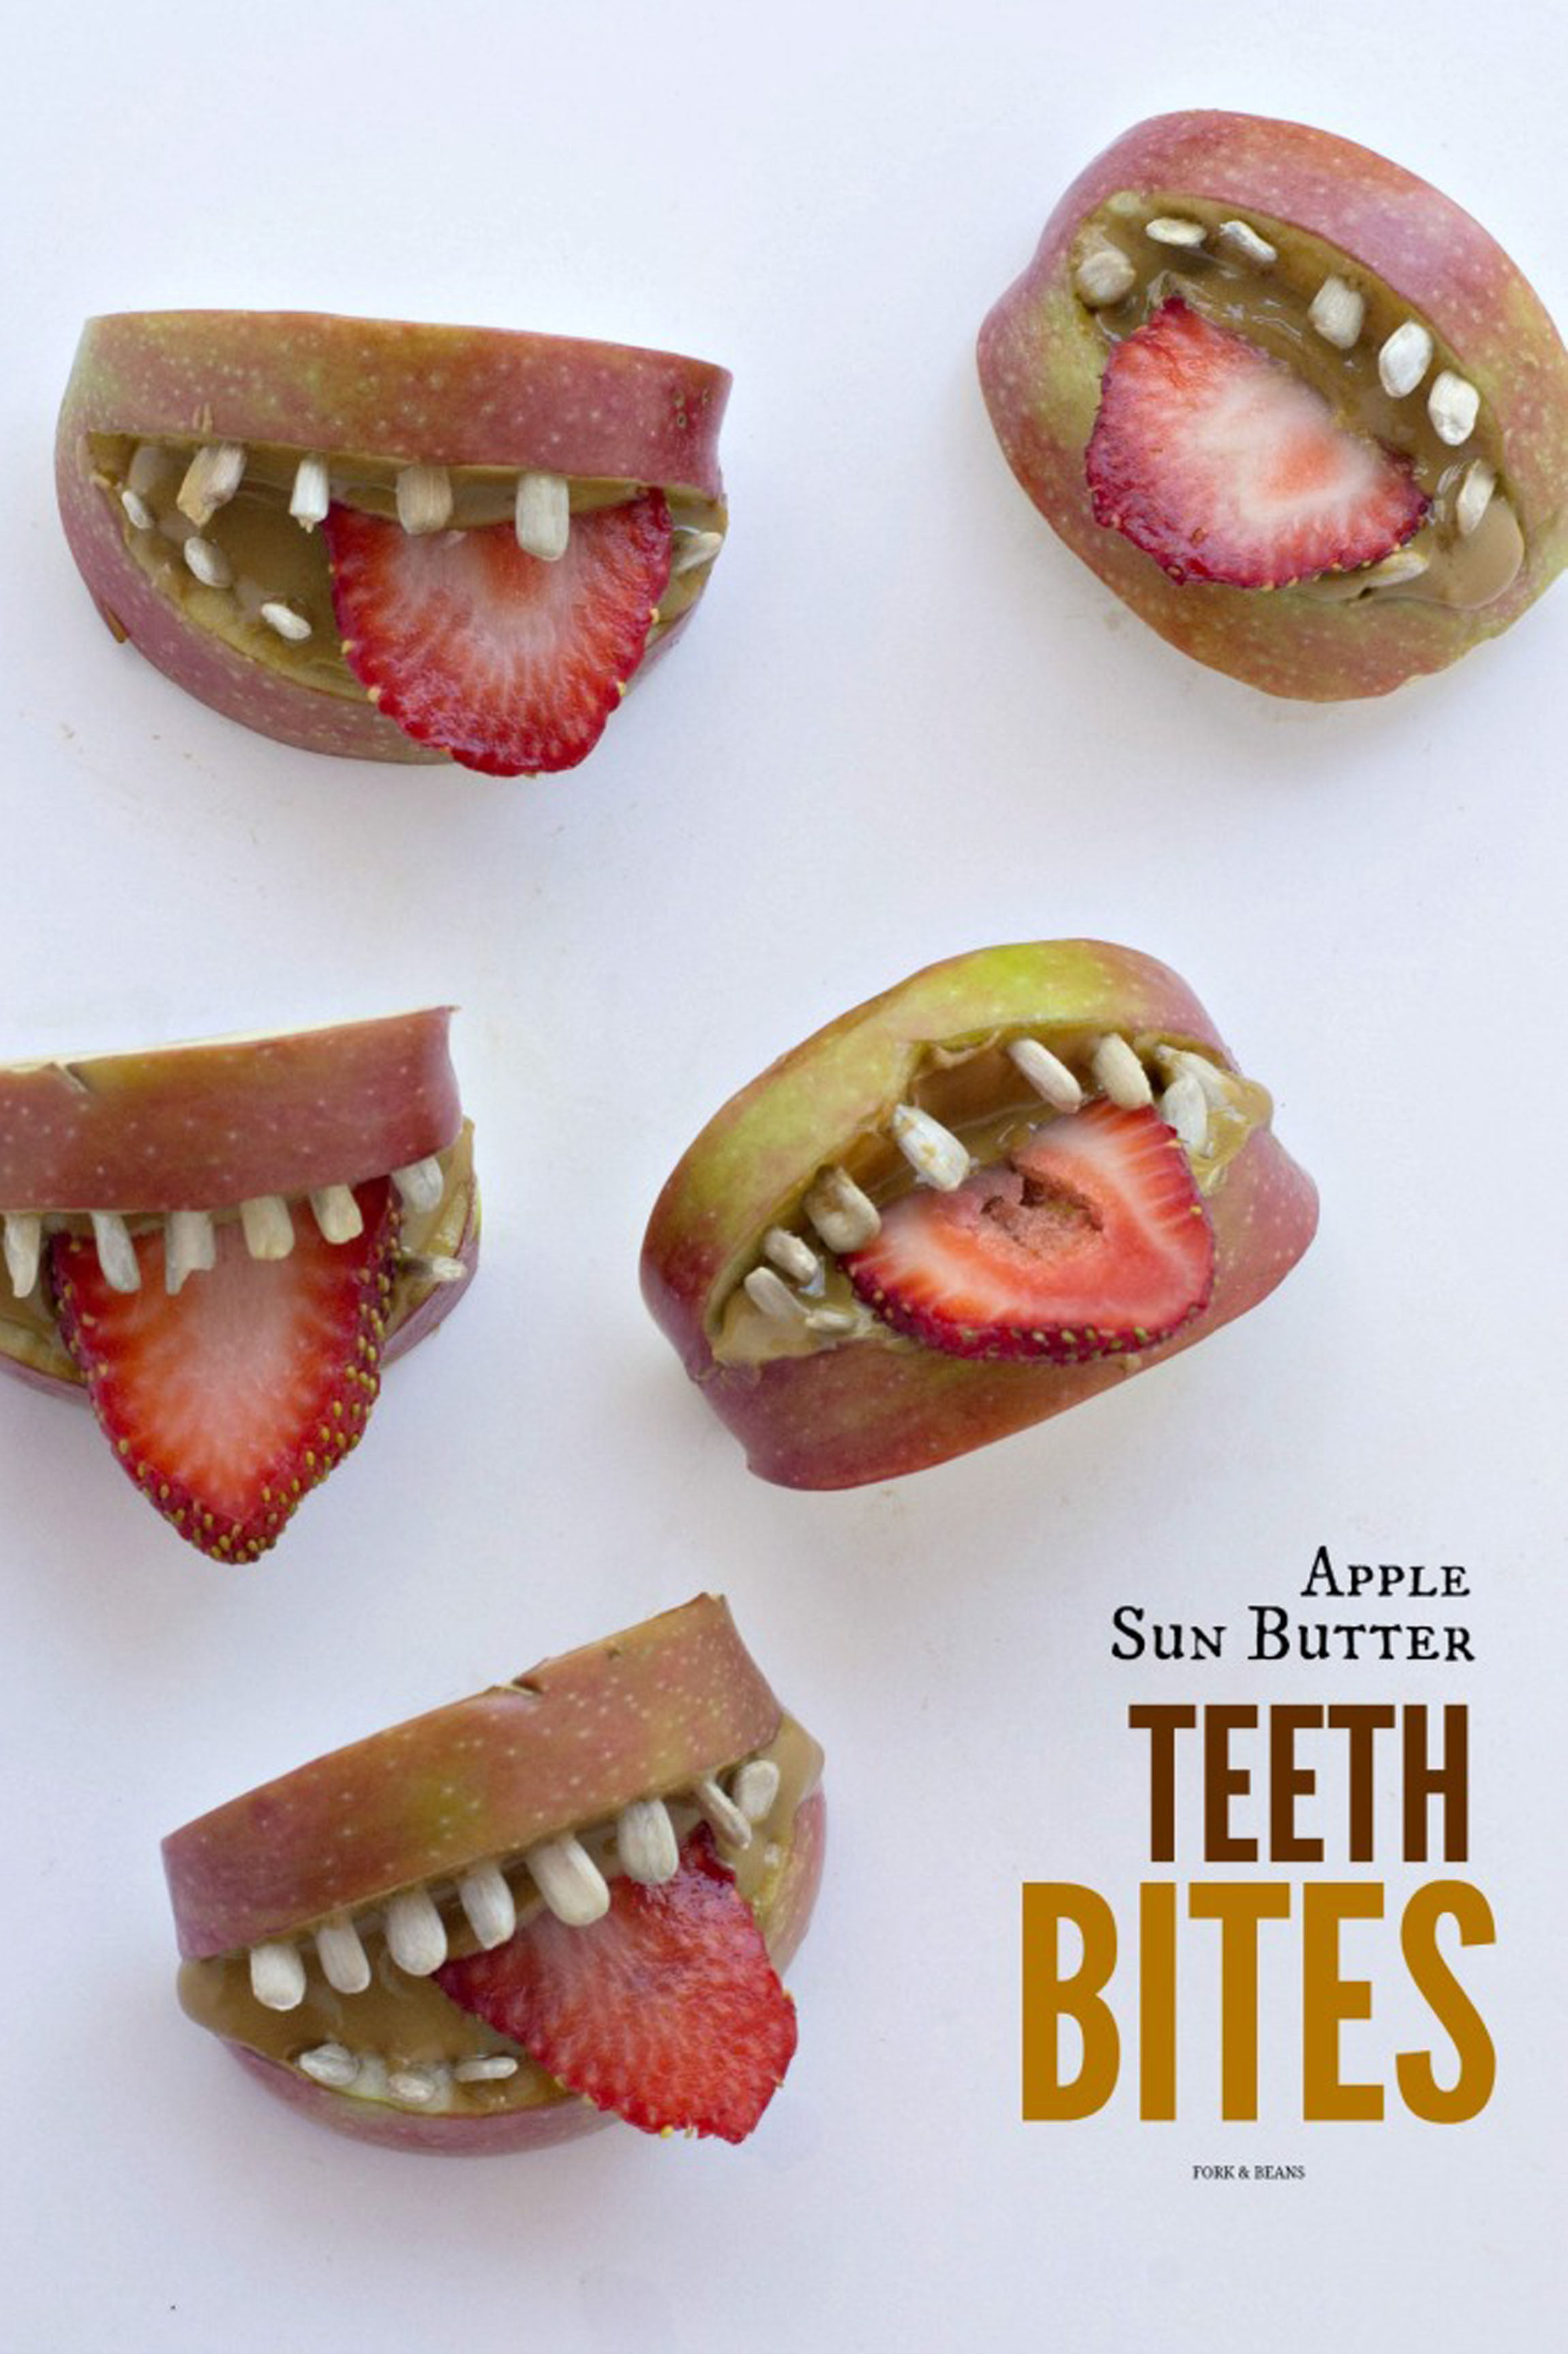 Healthy Halloween Snacks & Treats: Apple Sunbutter Teeth Bites